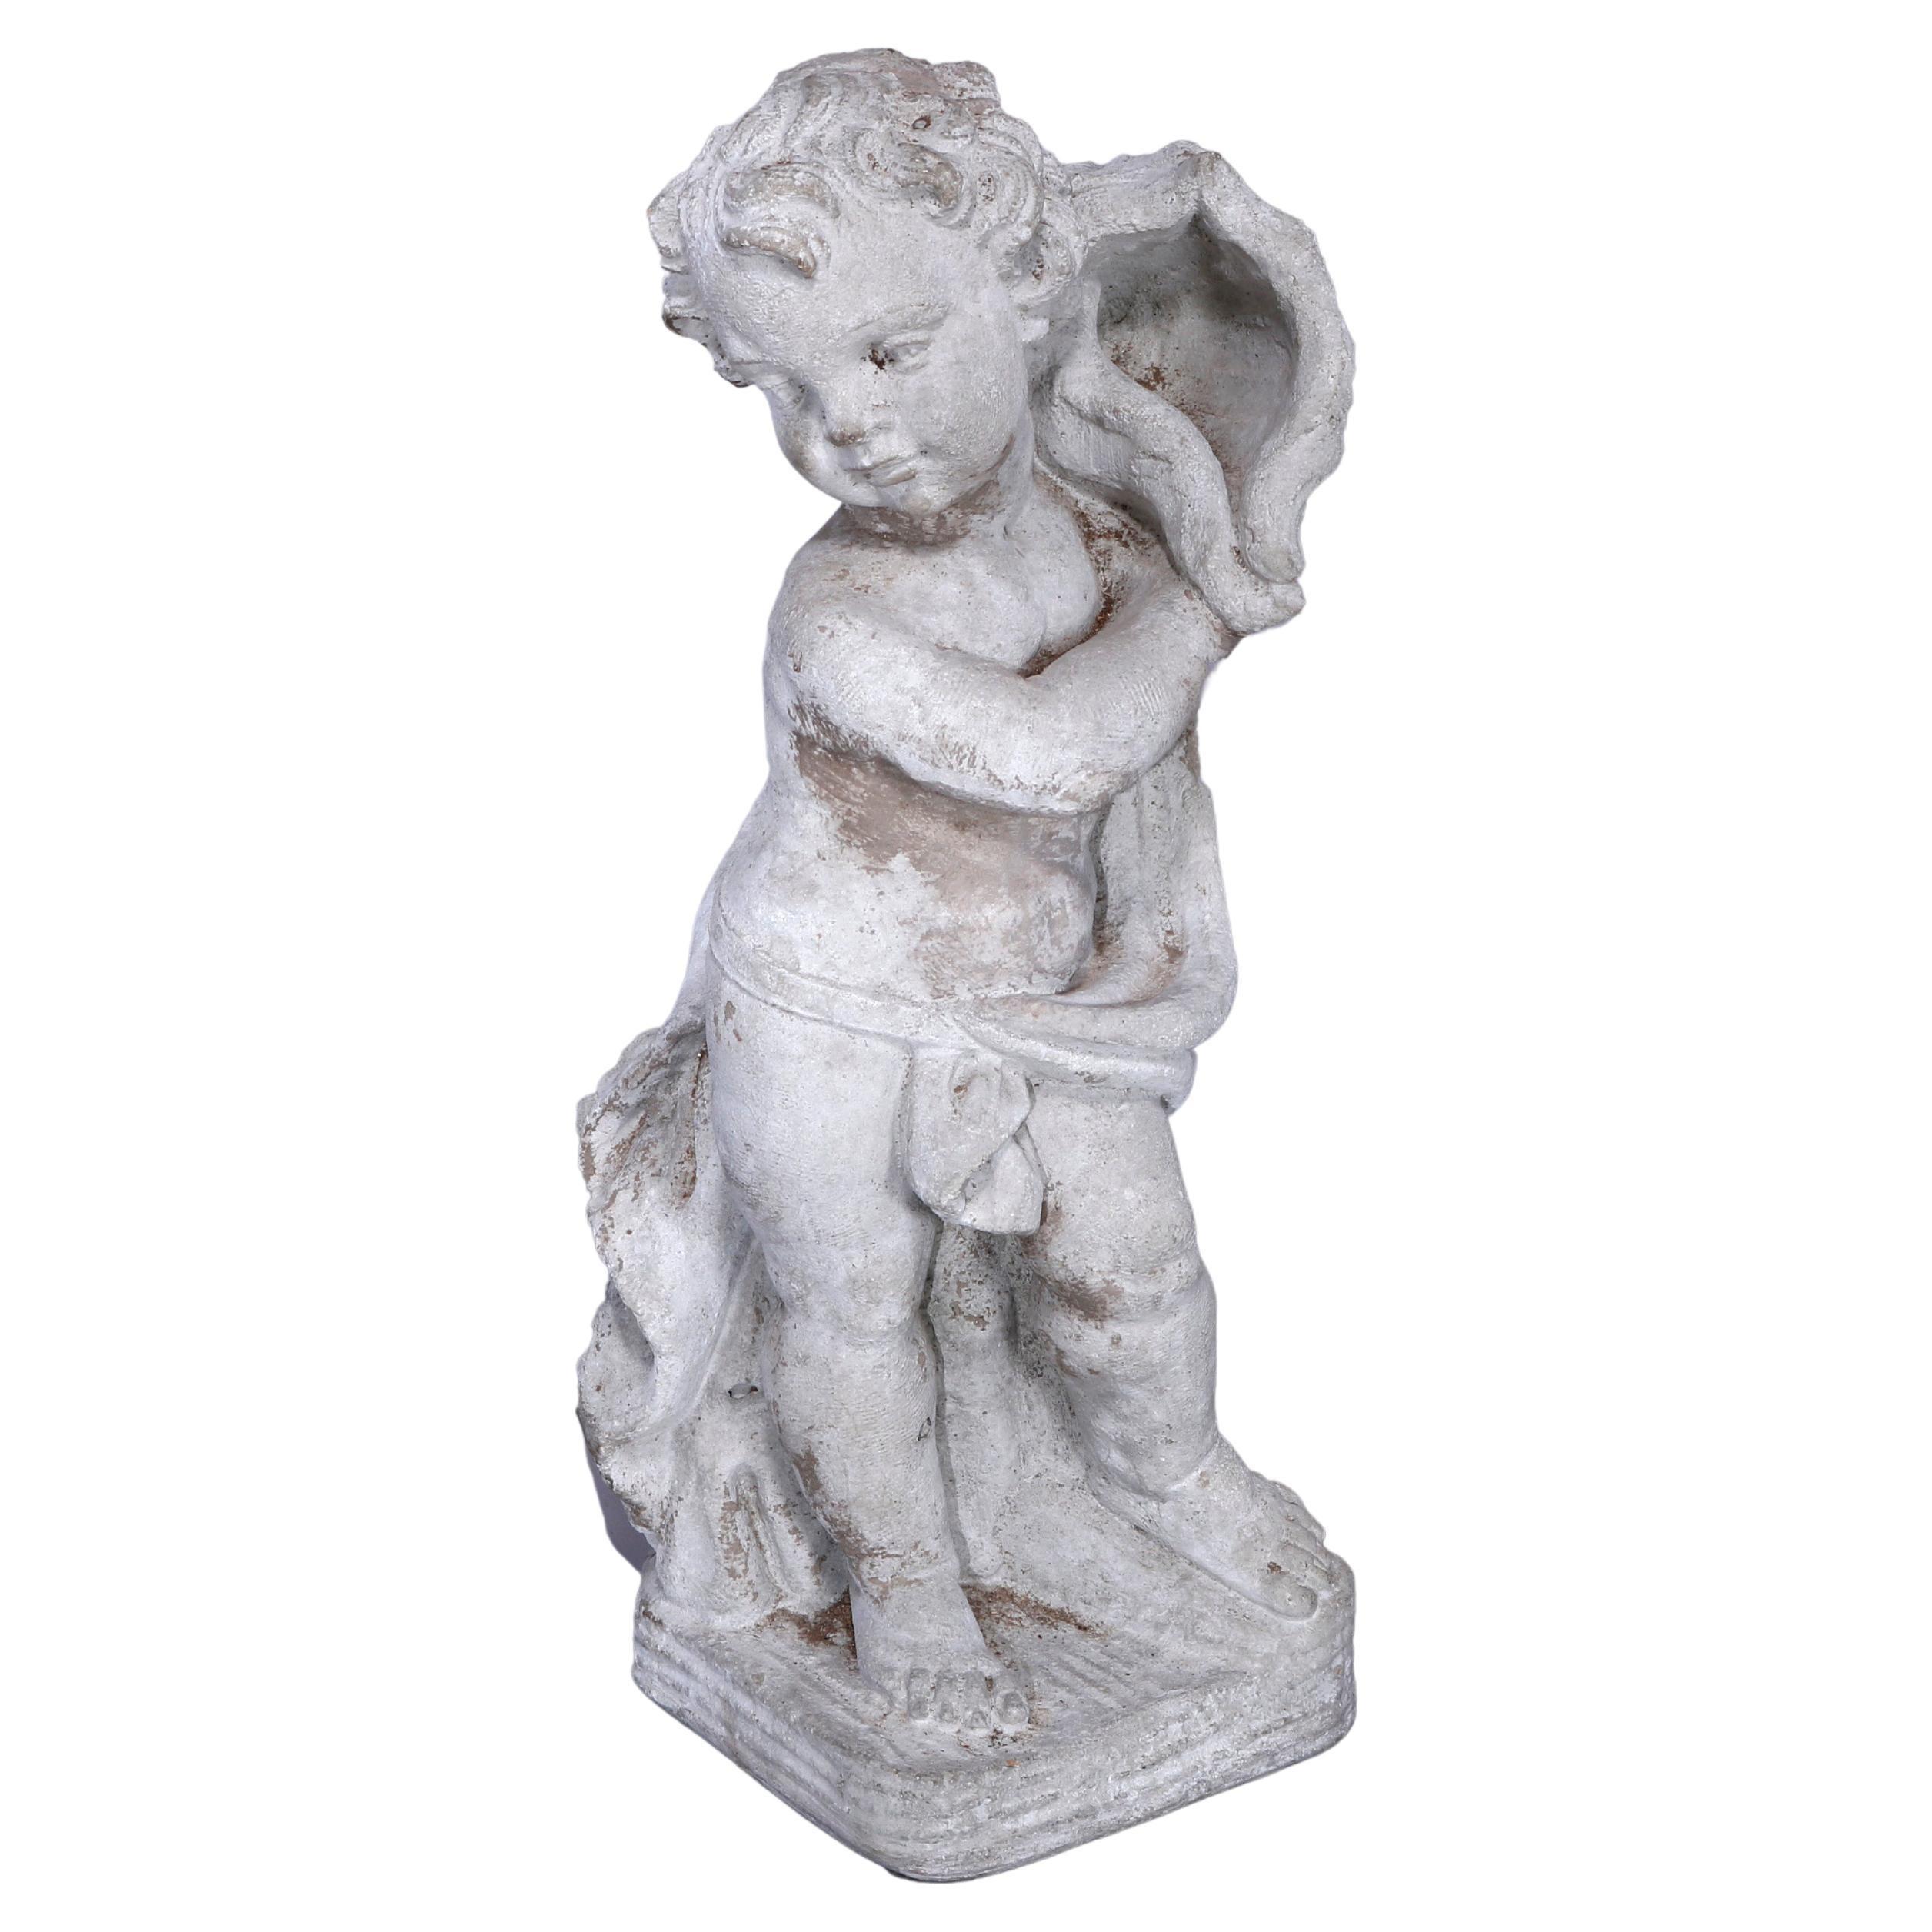 Neoclassical Figural Cast Hard Stone Garden Statue, Cherub with Shell, 20th C